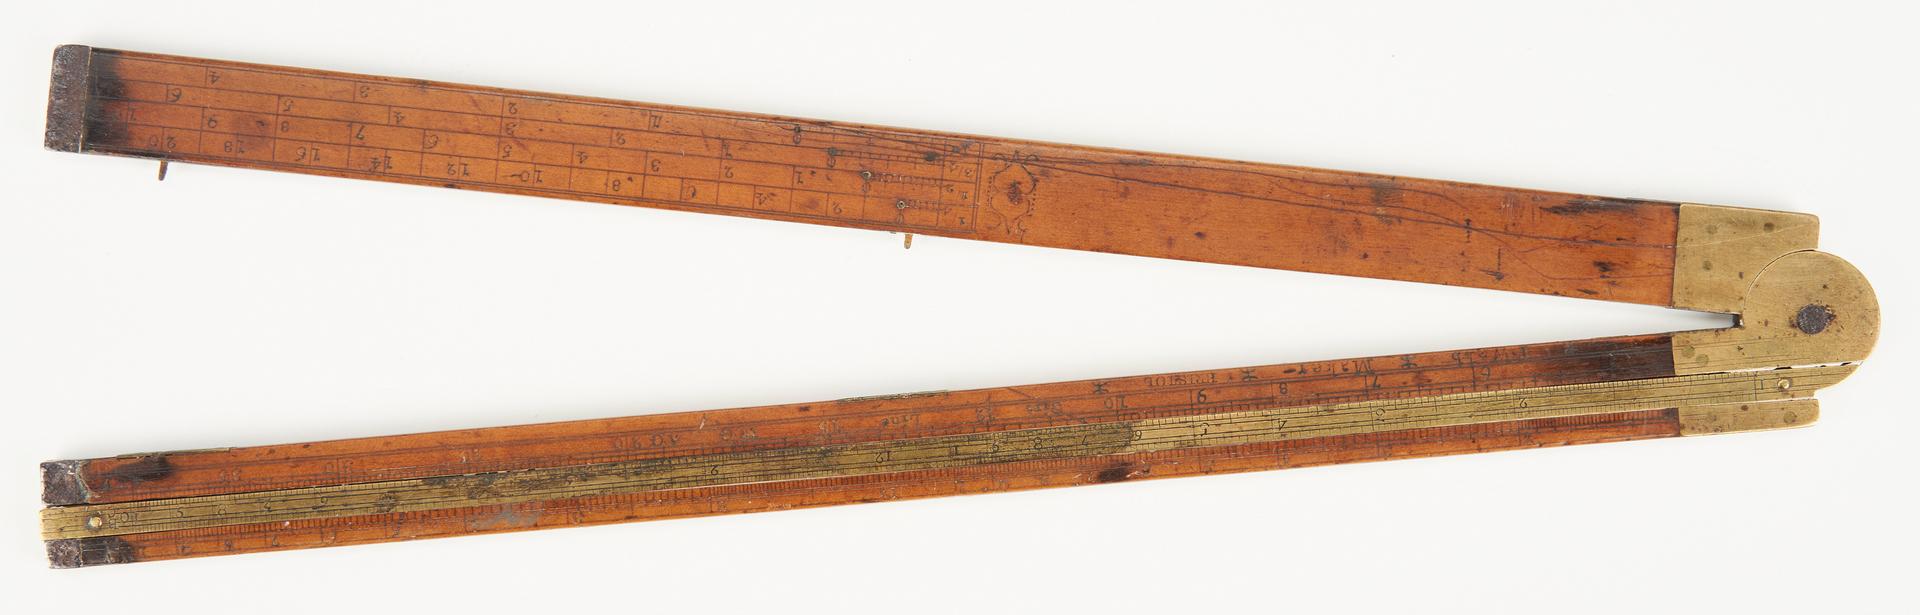 Lot 1044: 2 Early Slide Rules, George III Perpetual Calendar, 3 items